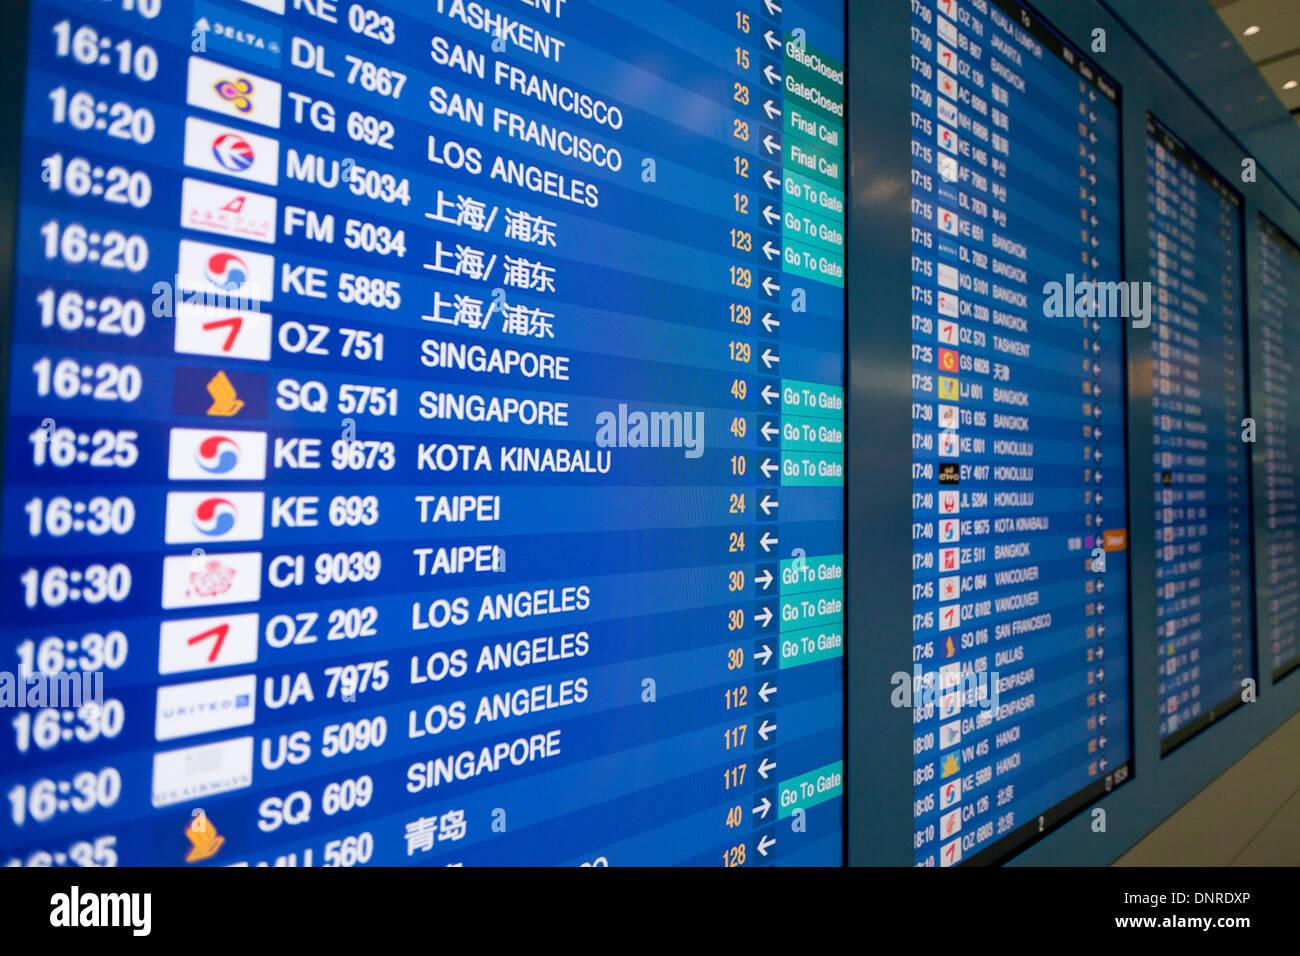 Flip display board at Incheon International Ariport - Incheon, South Korea - Stock Image